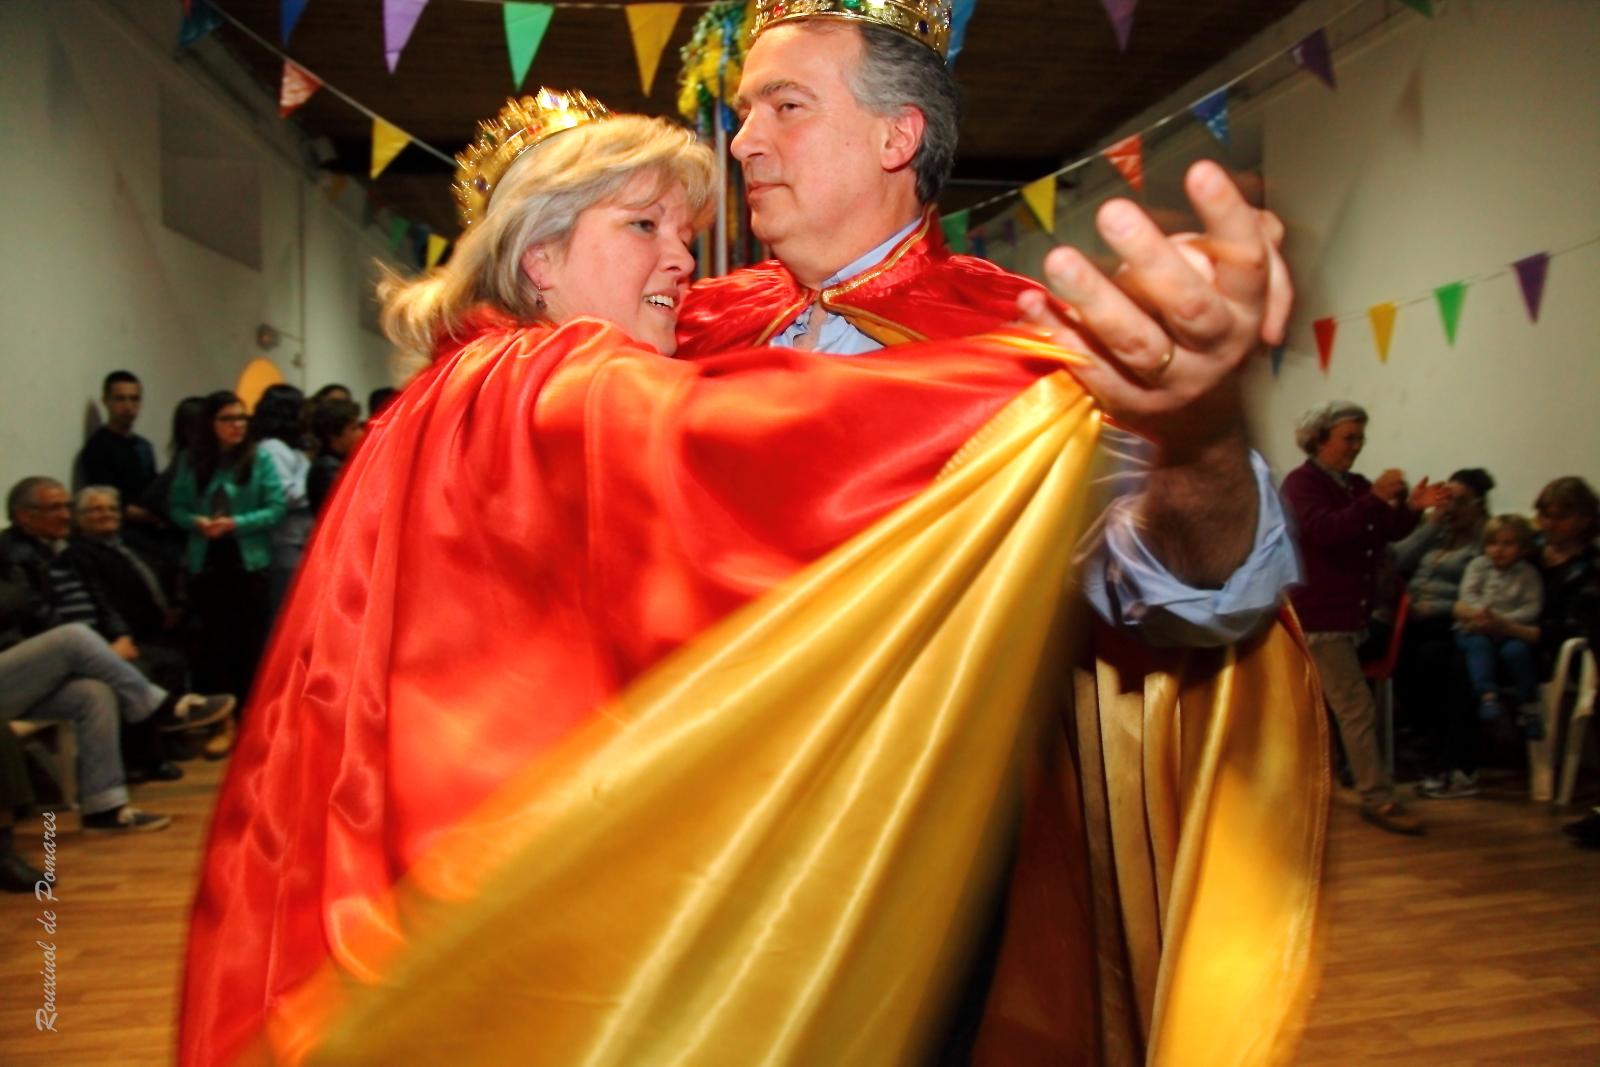 Baile da Pinha -2015 - Soito da Ruiva (001)